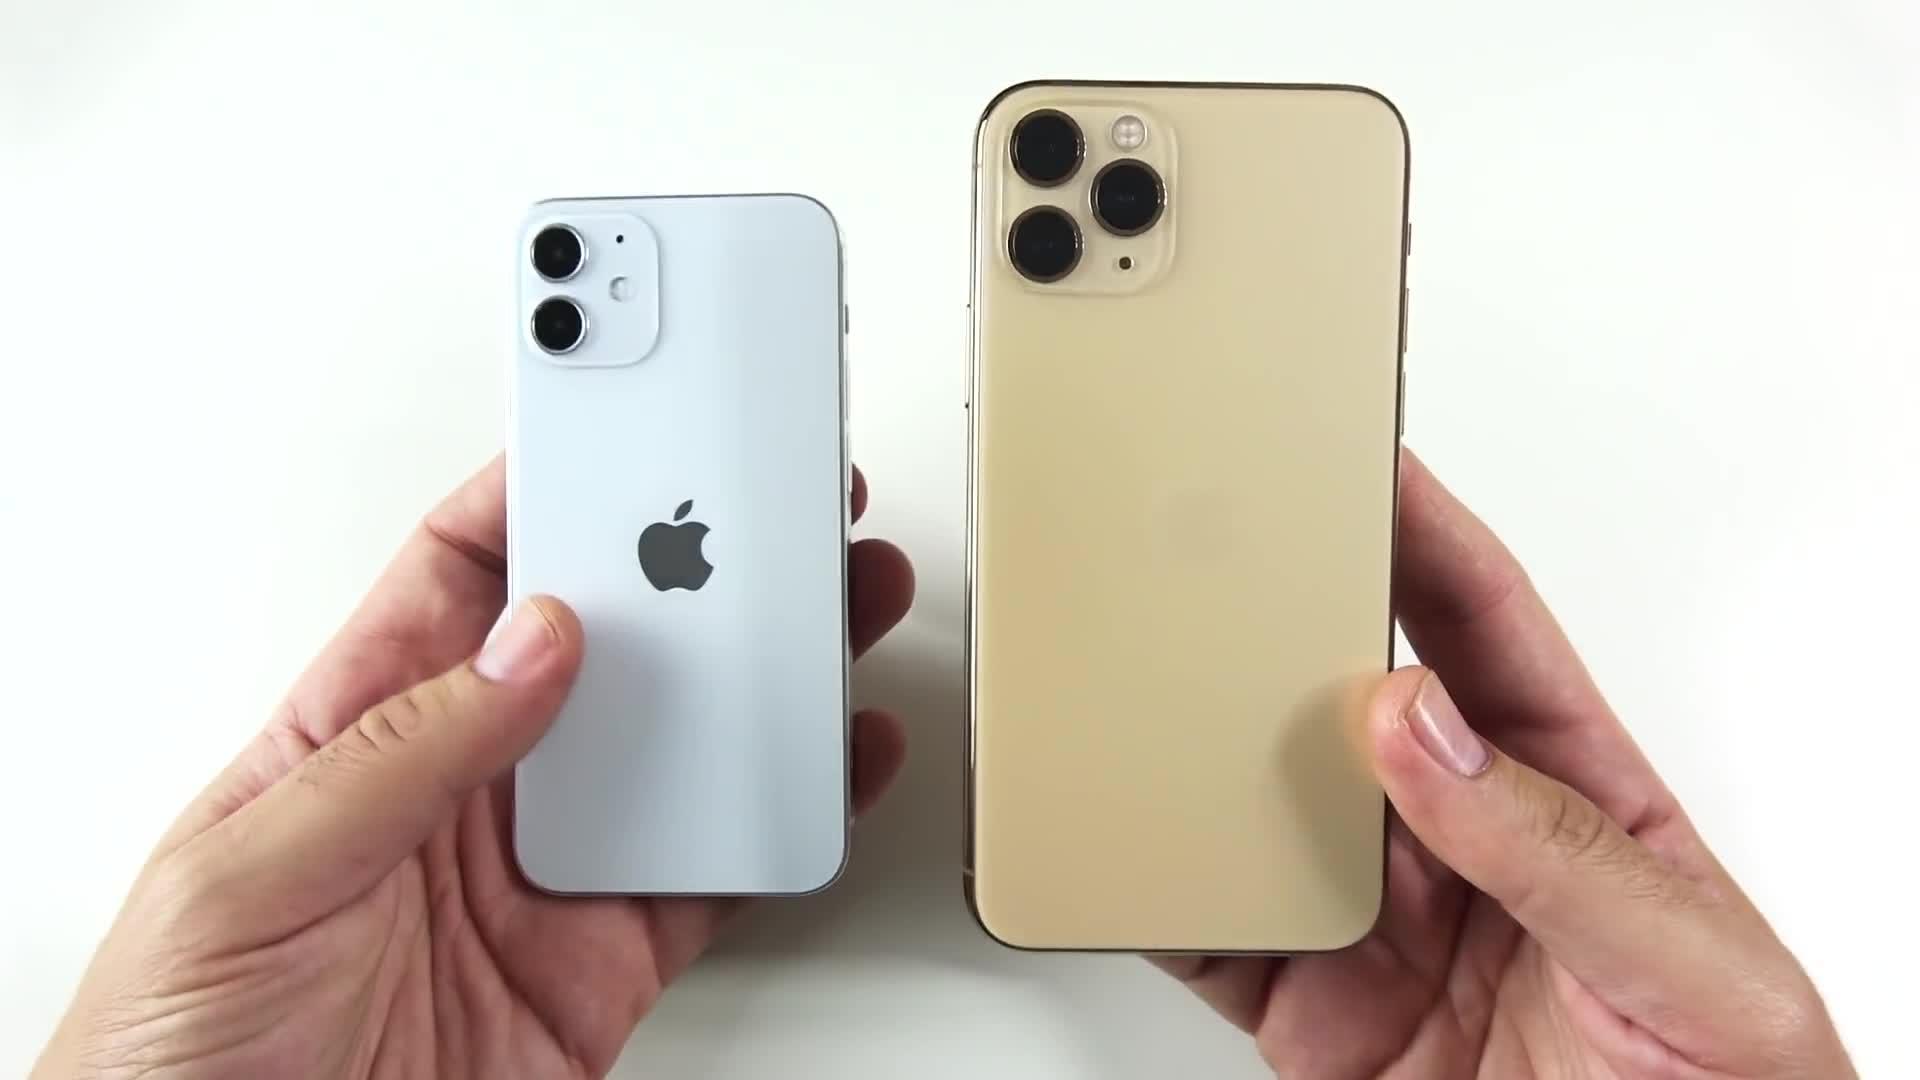 iPhone 12 Mini vs iPhone SE 2020 尺寸对比 - 知乎